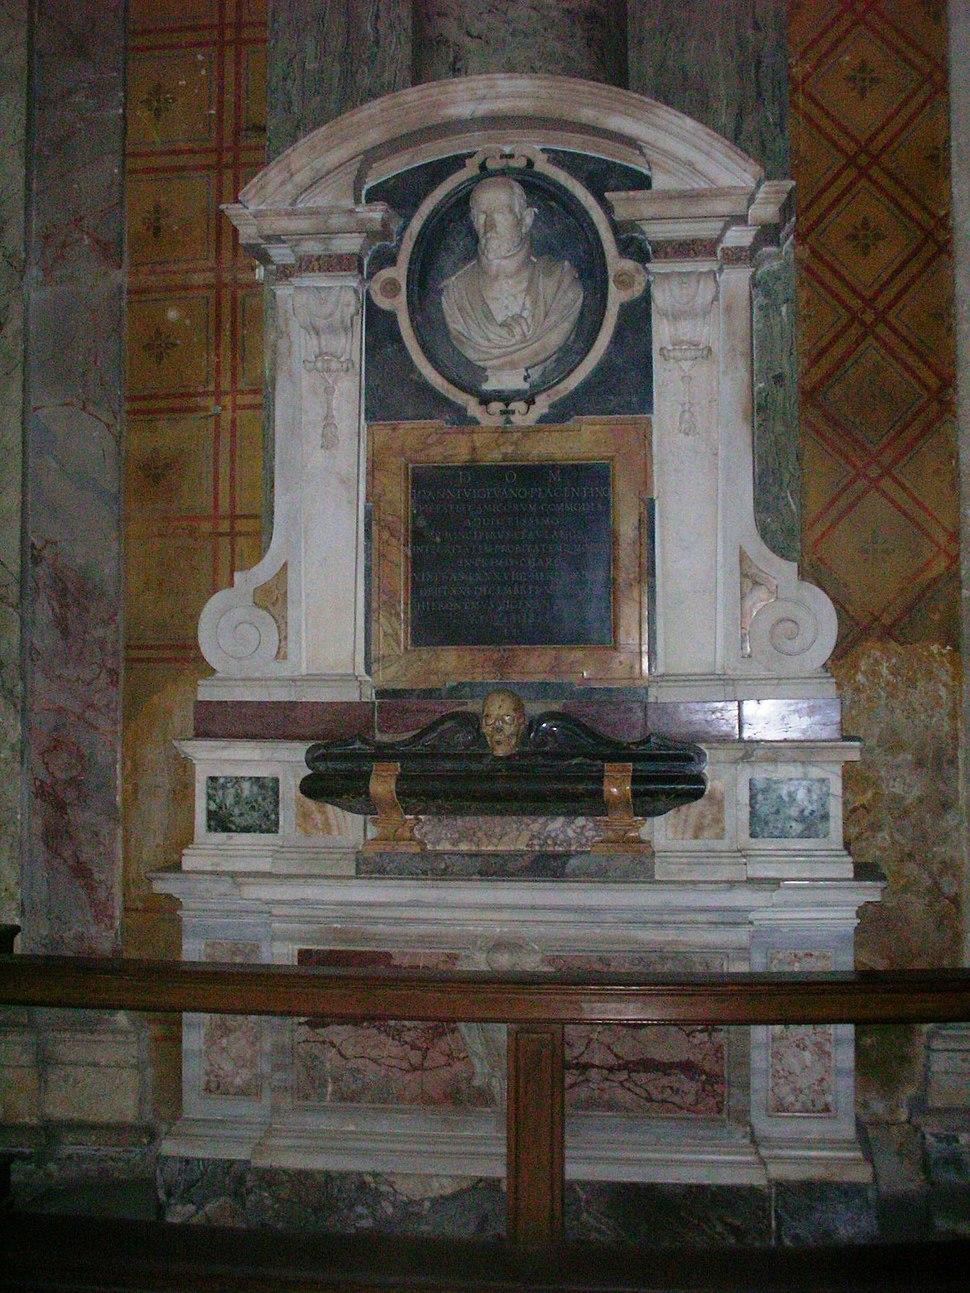 SantaMariaSopraMinerva-MonumentoFunebreBernini04-SteO153